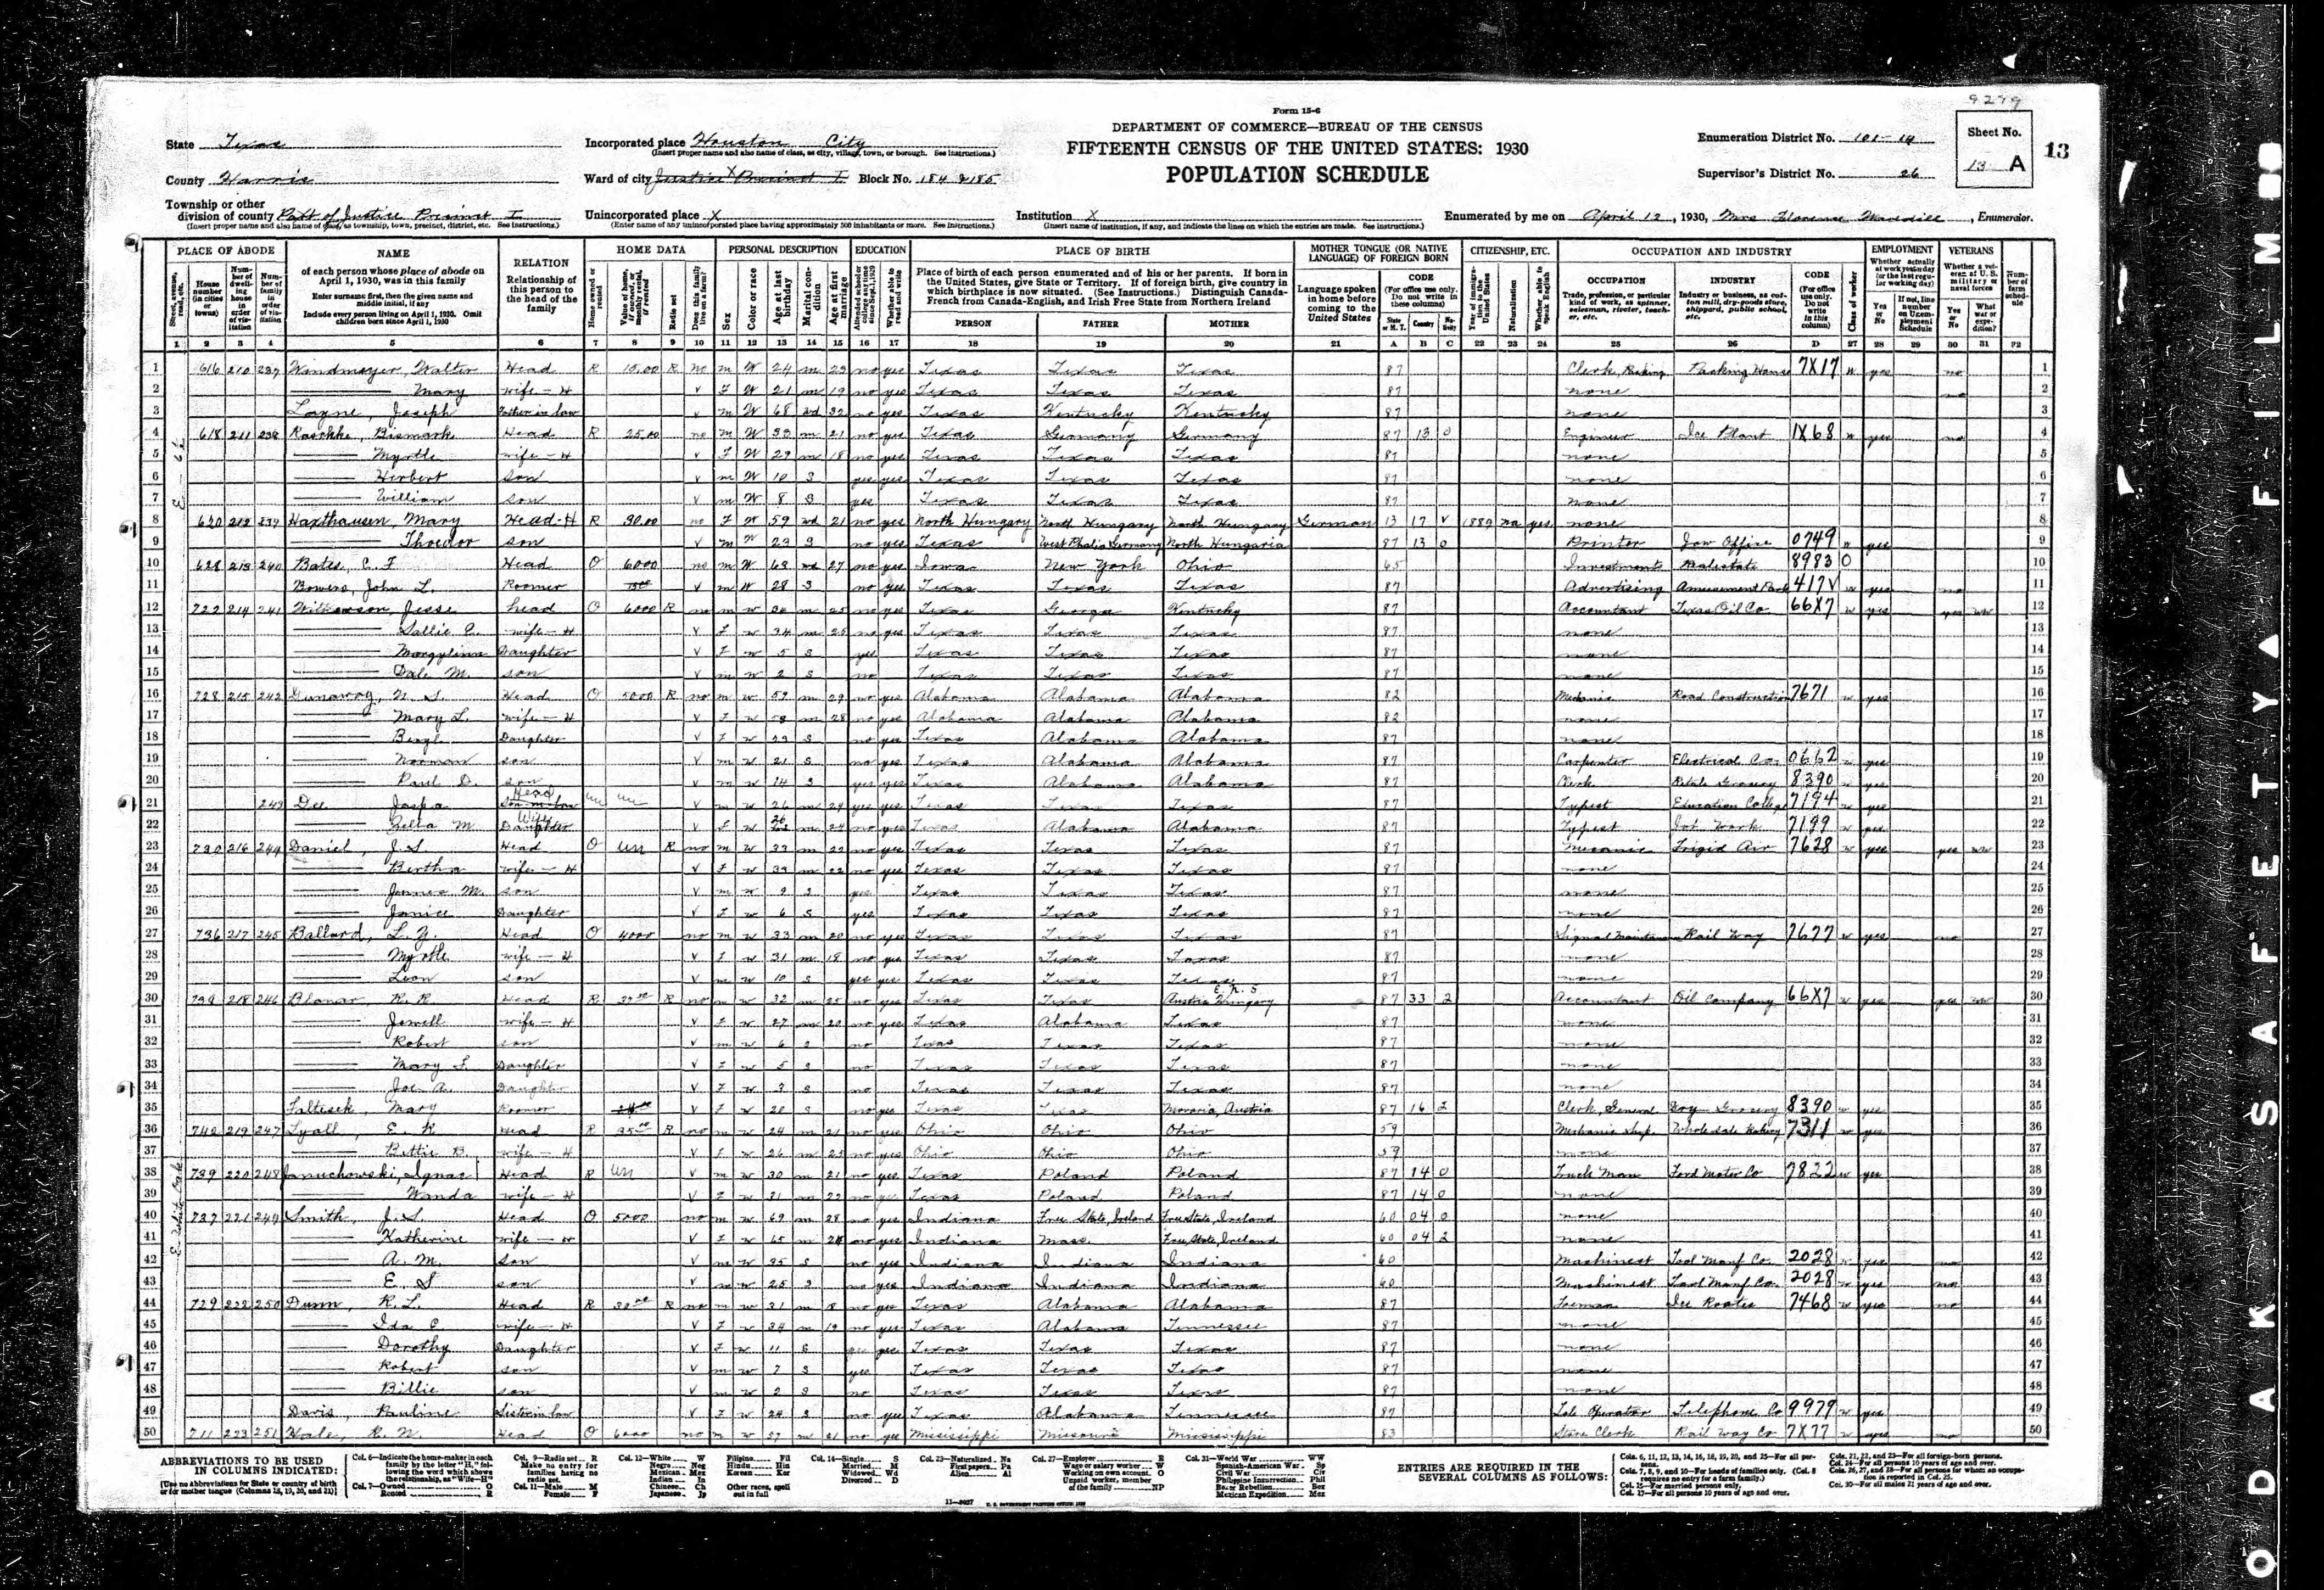 Contemporary Birth Certificate Translation Houston Mold